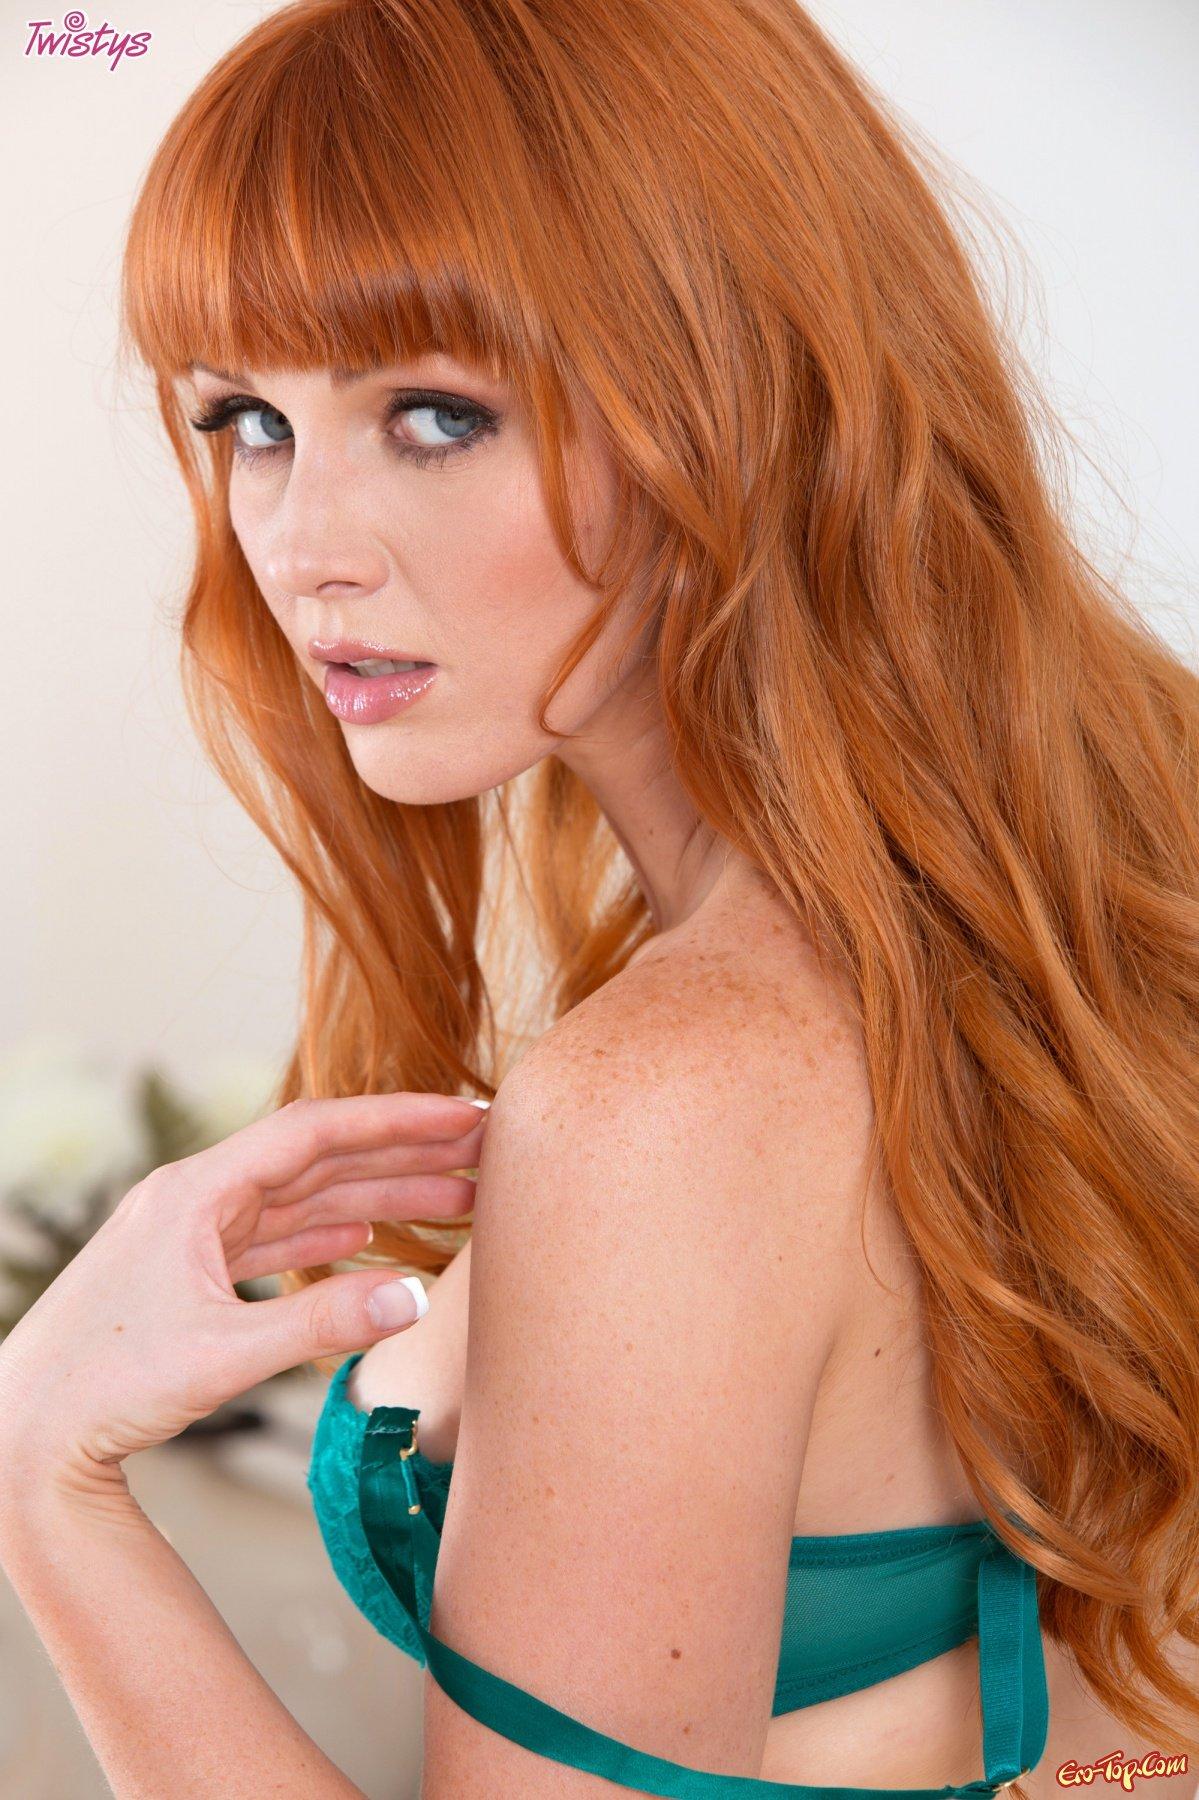 Marie McCray - волосатая пися секс фото